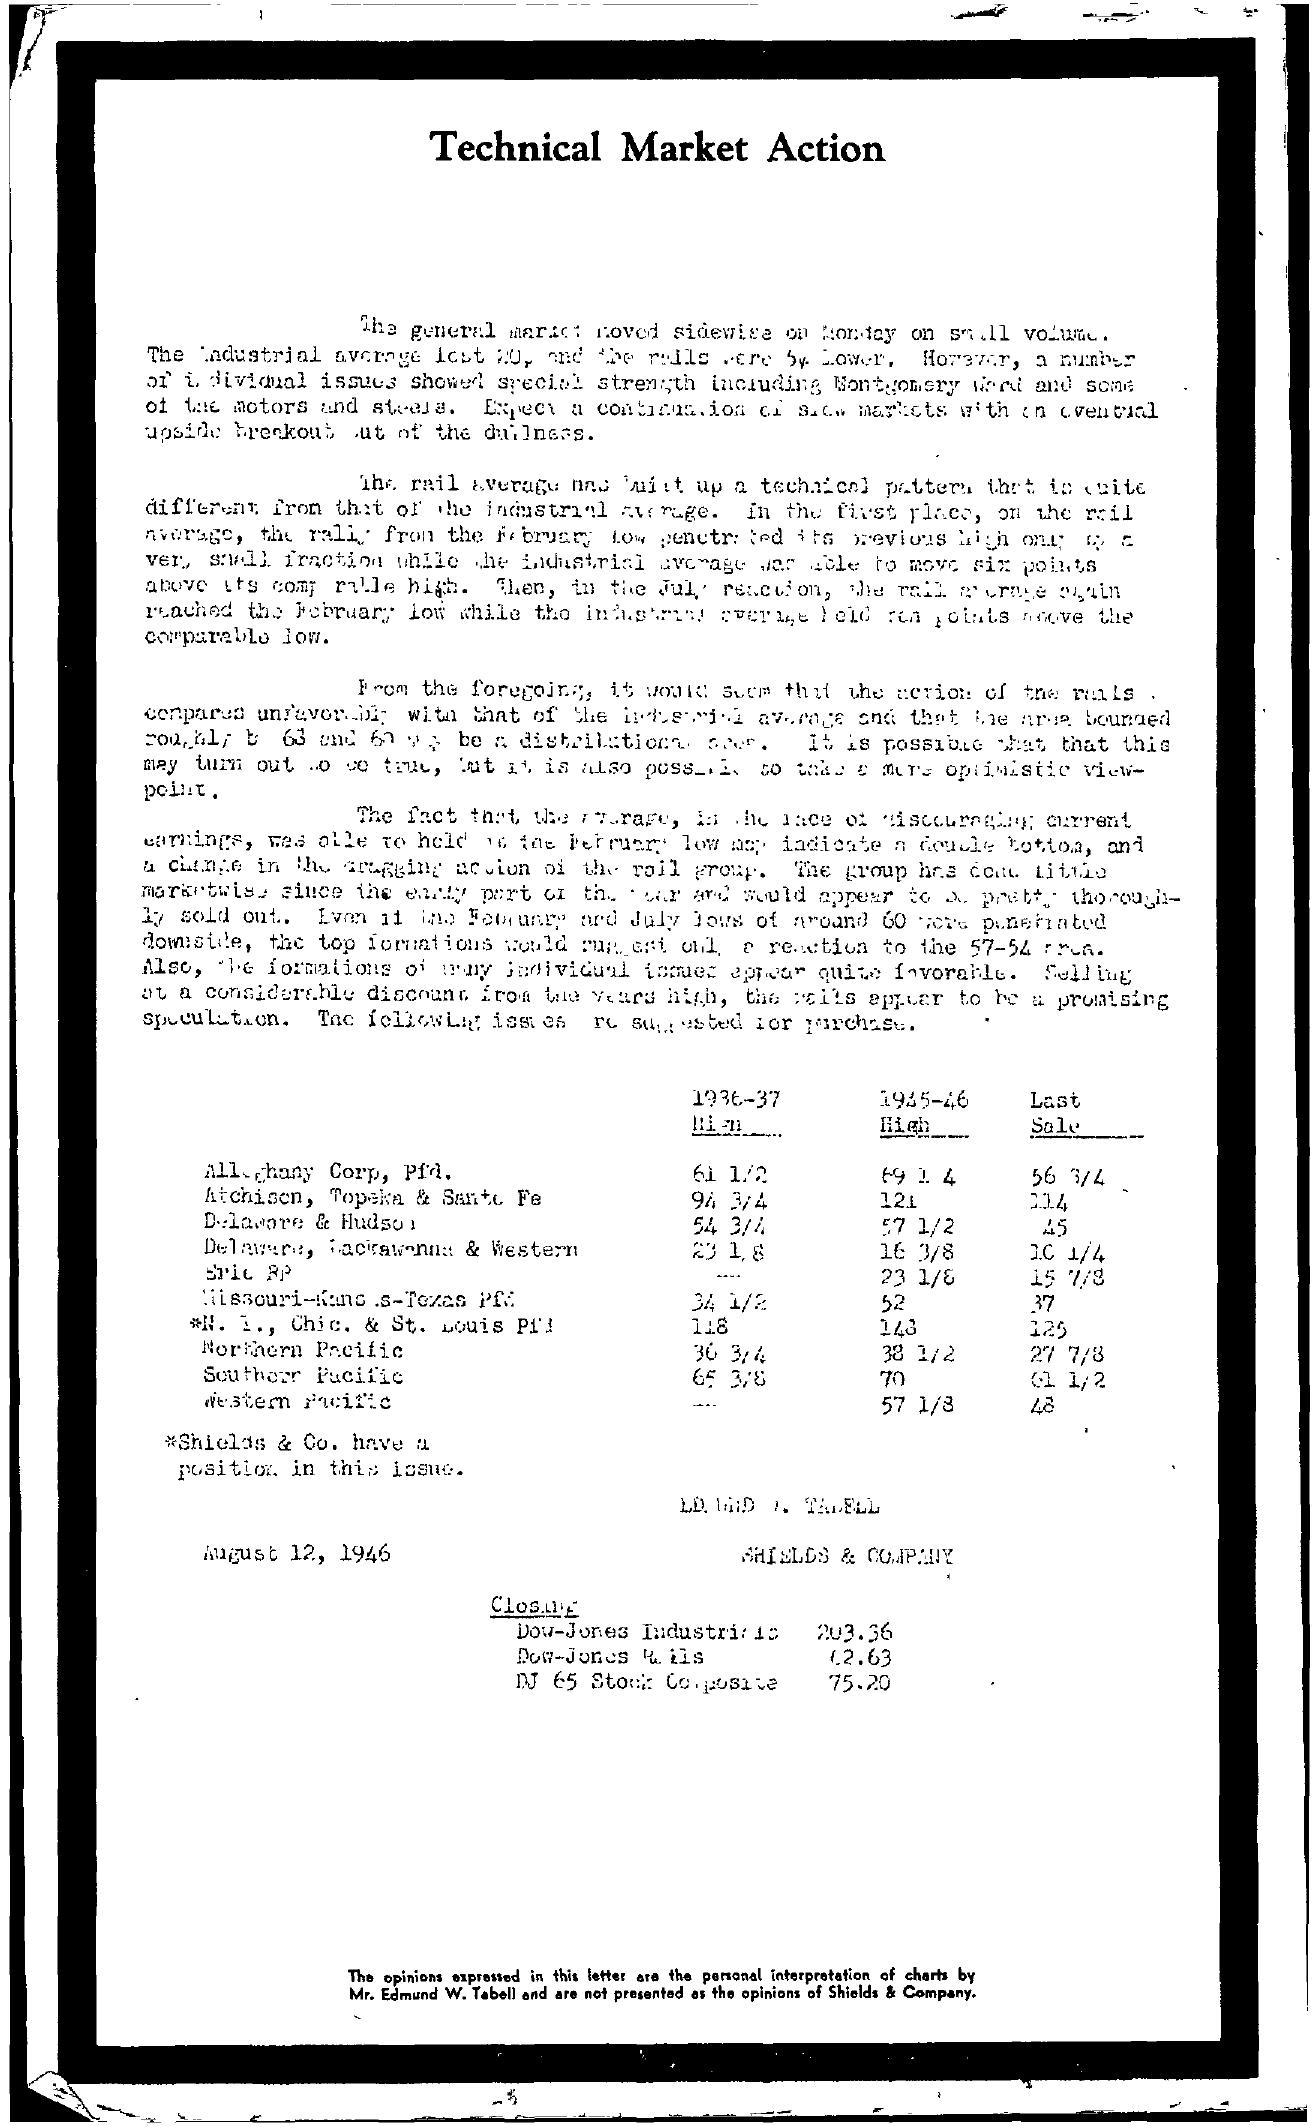 Tabell's Market Letter - August 12, 1946